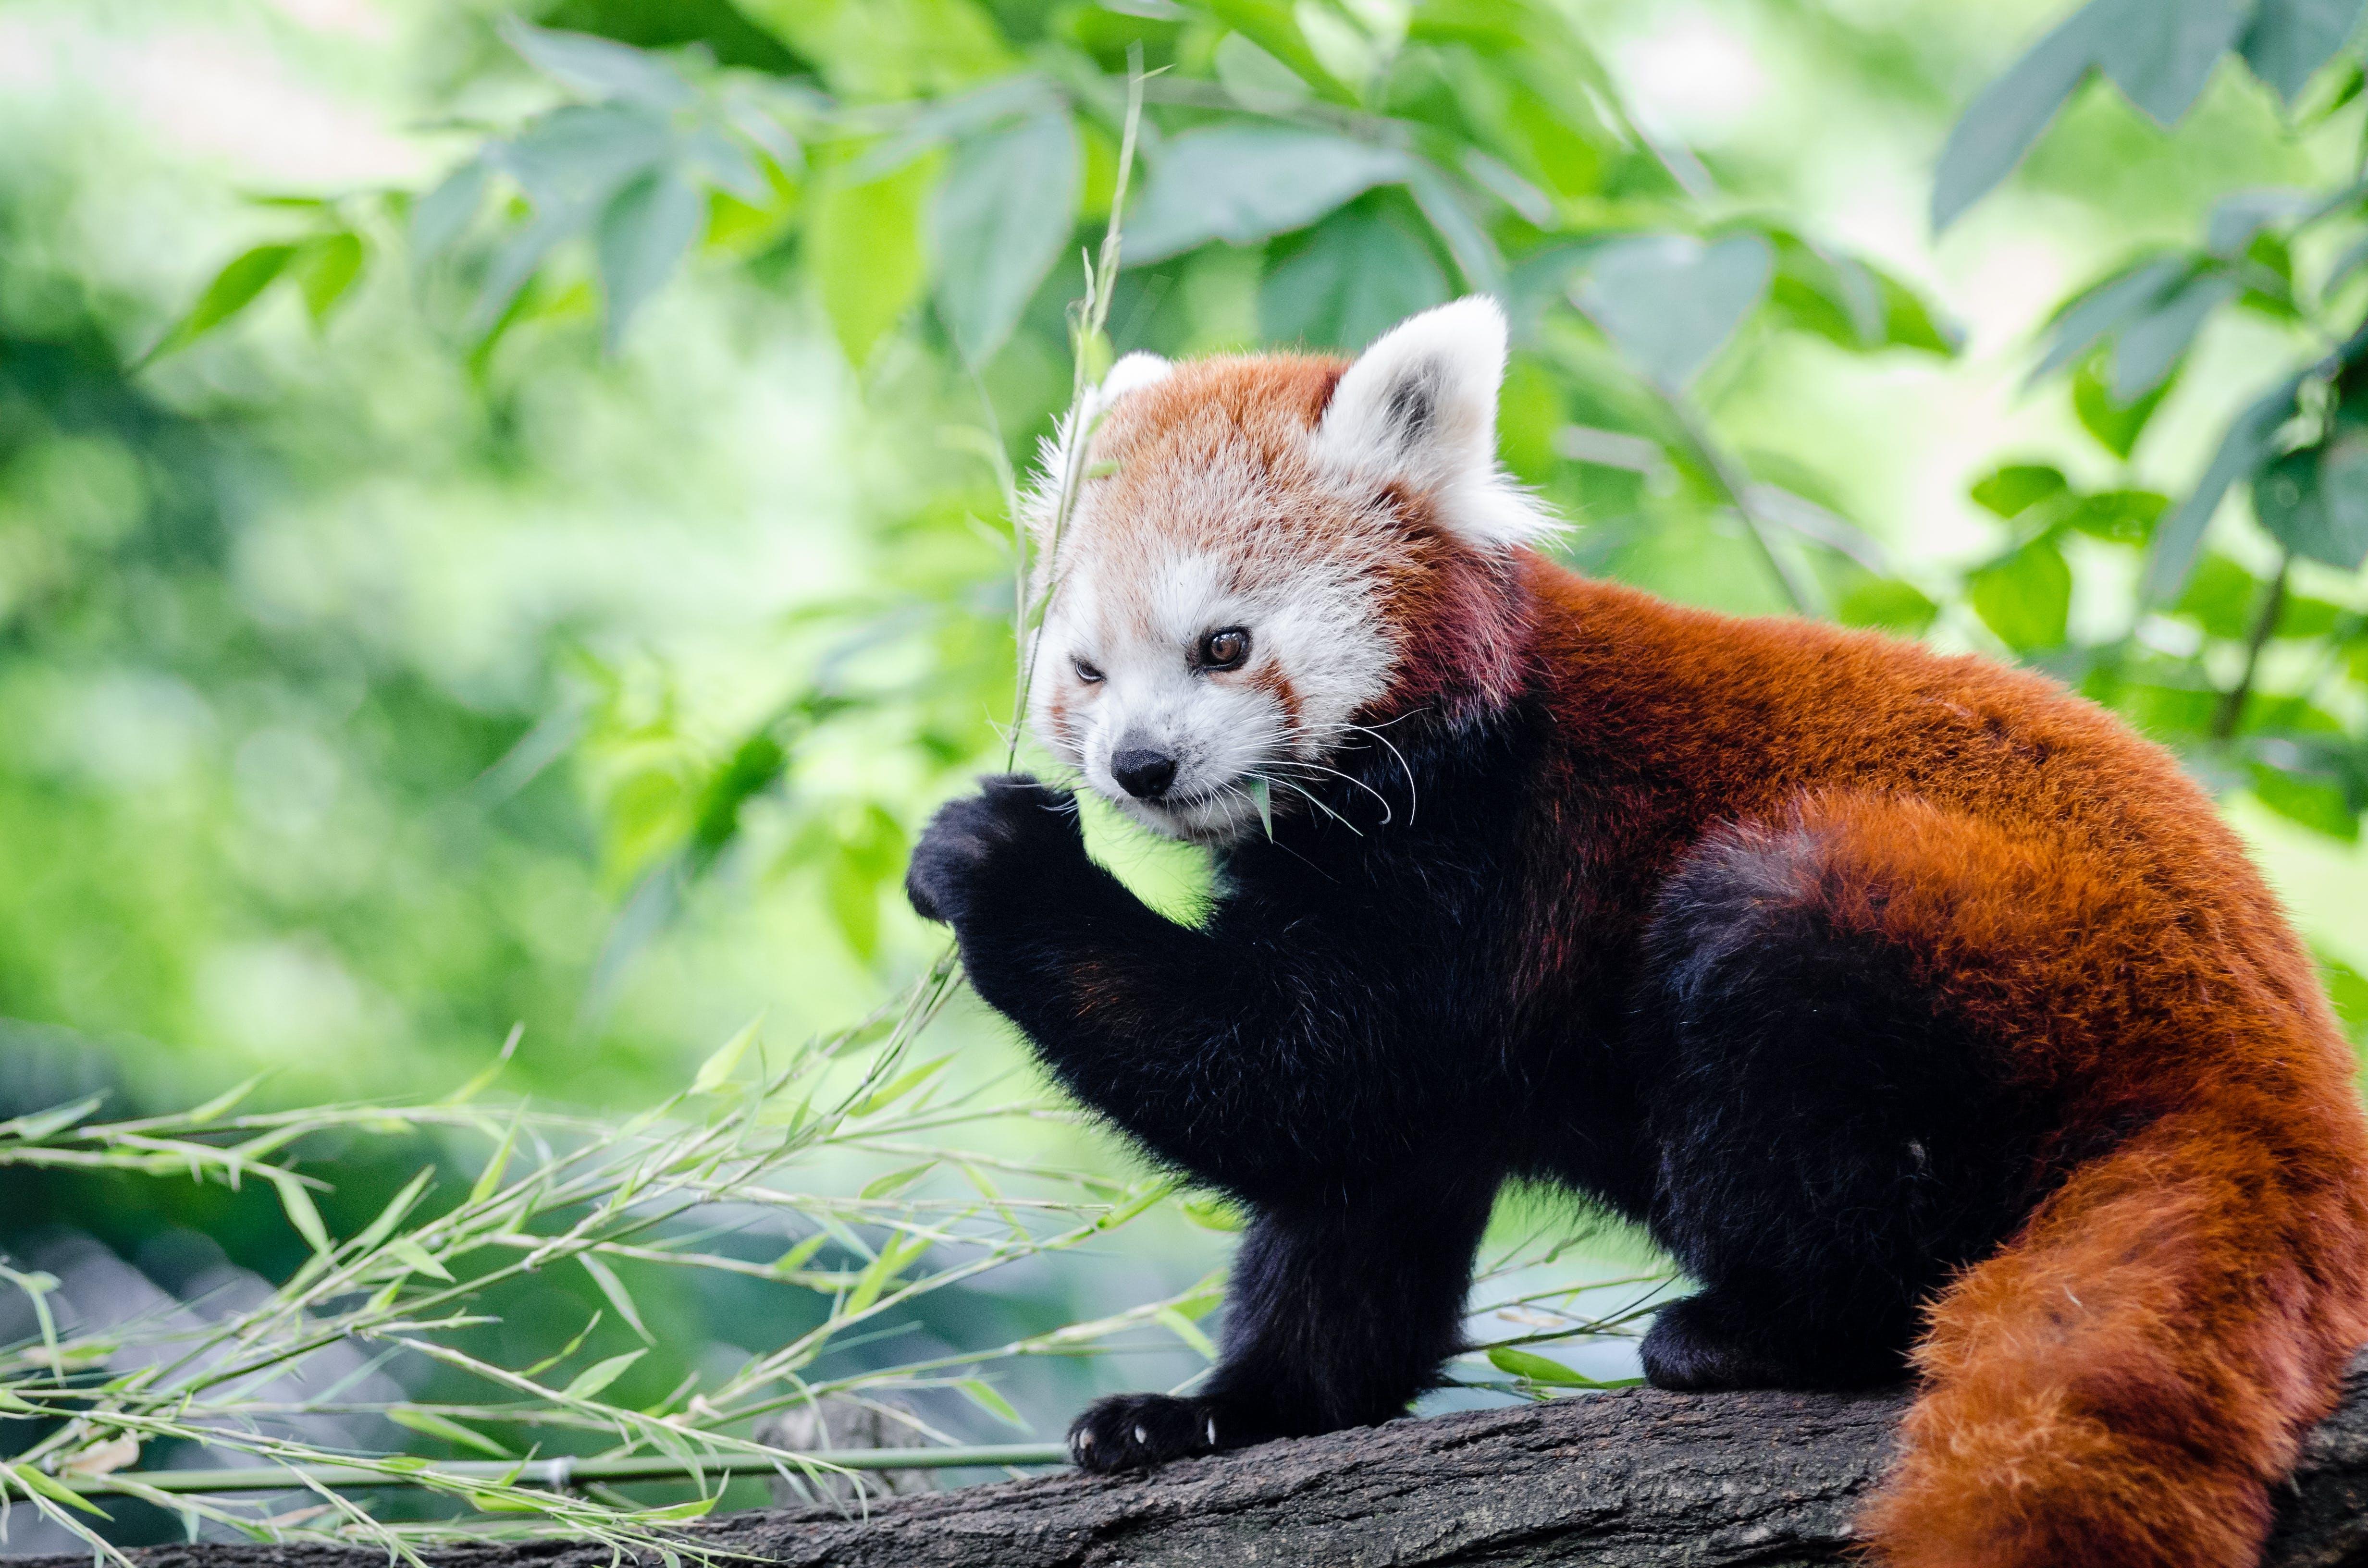 Kostenloses Stock Foto zu holz, niedlich, roter panda, tier